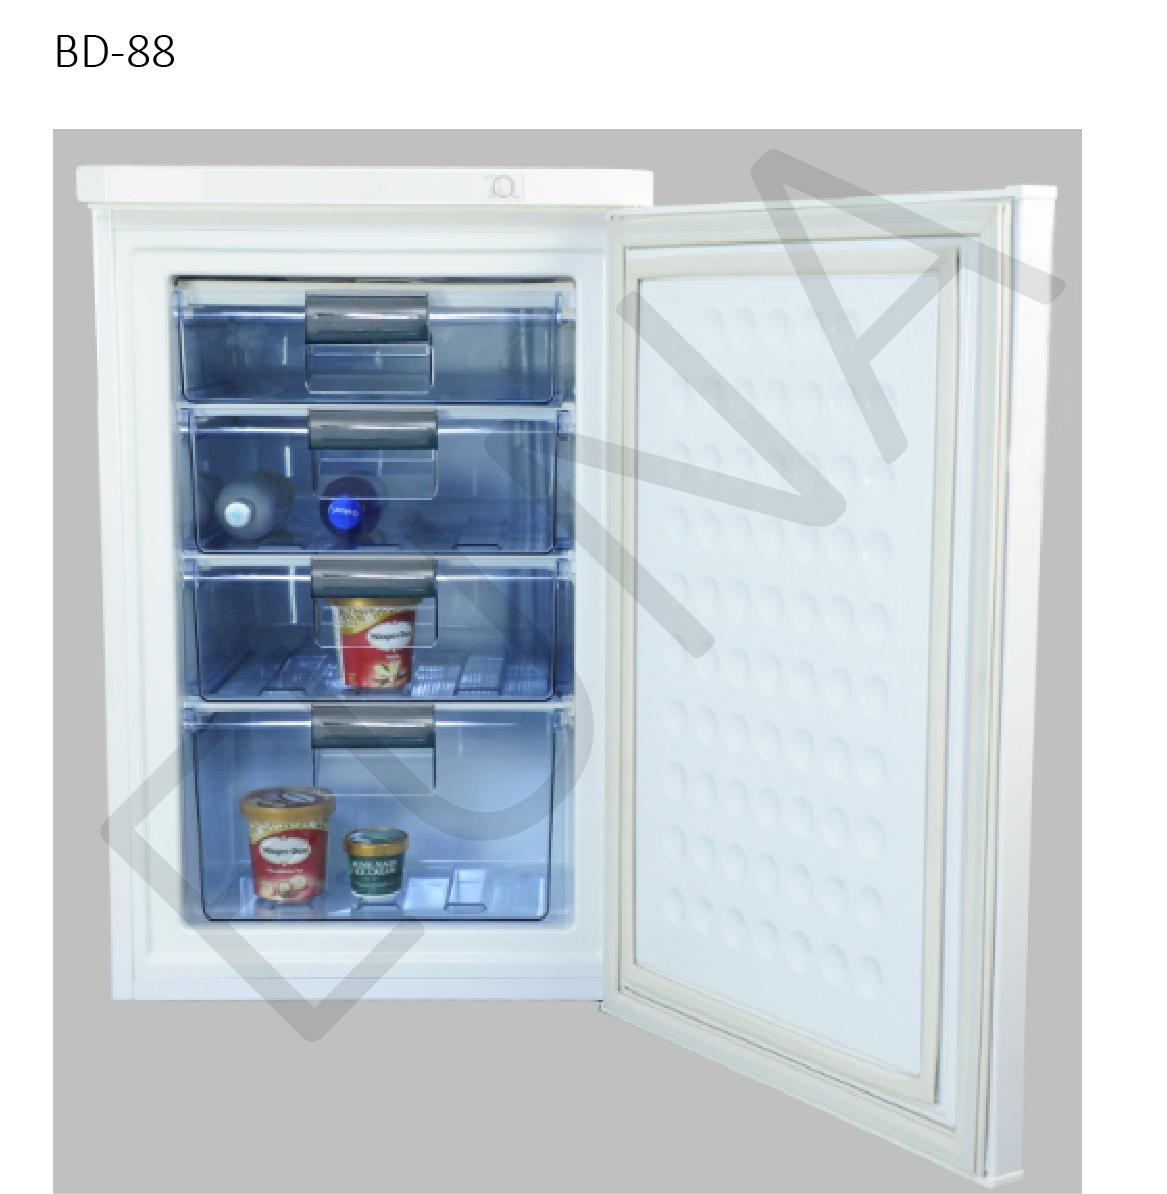 BD-88 freezer